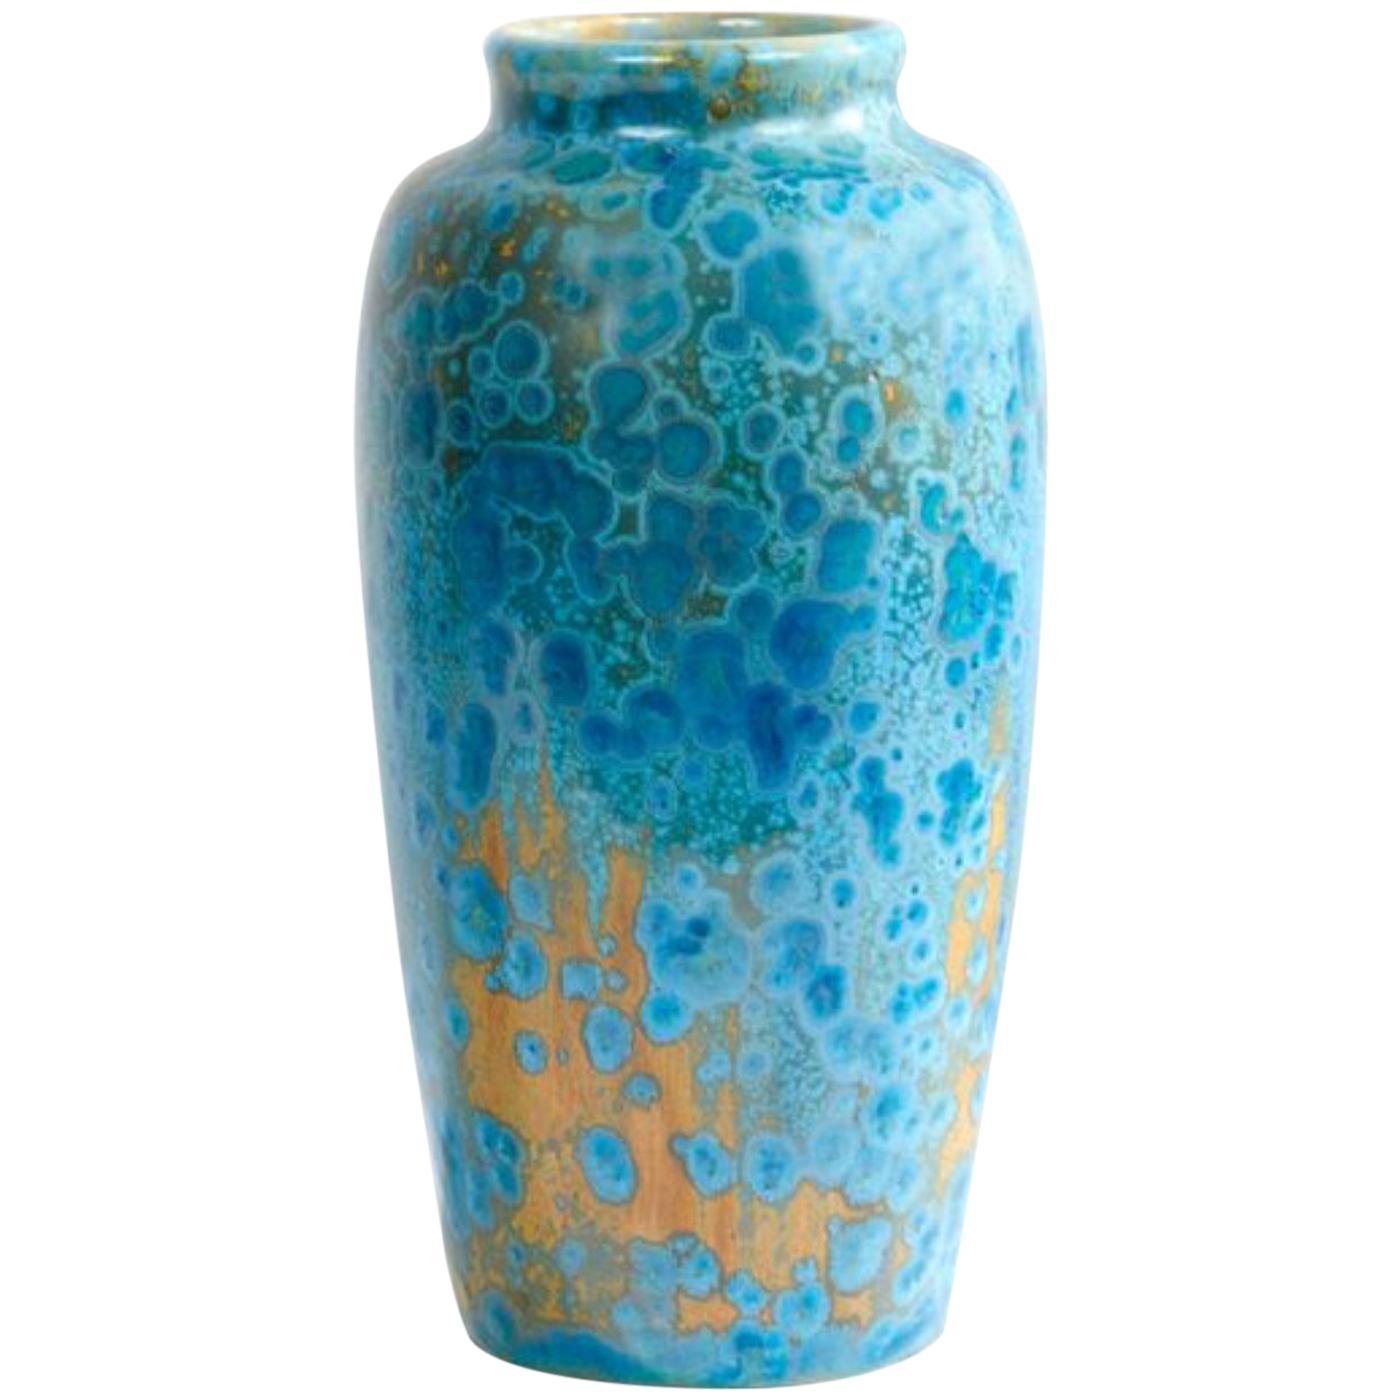 20th Century French Art Nouveau Pierrefonds Pottery Vase